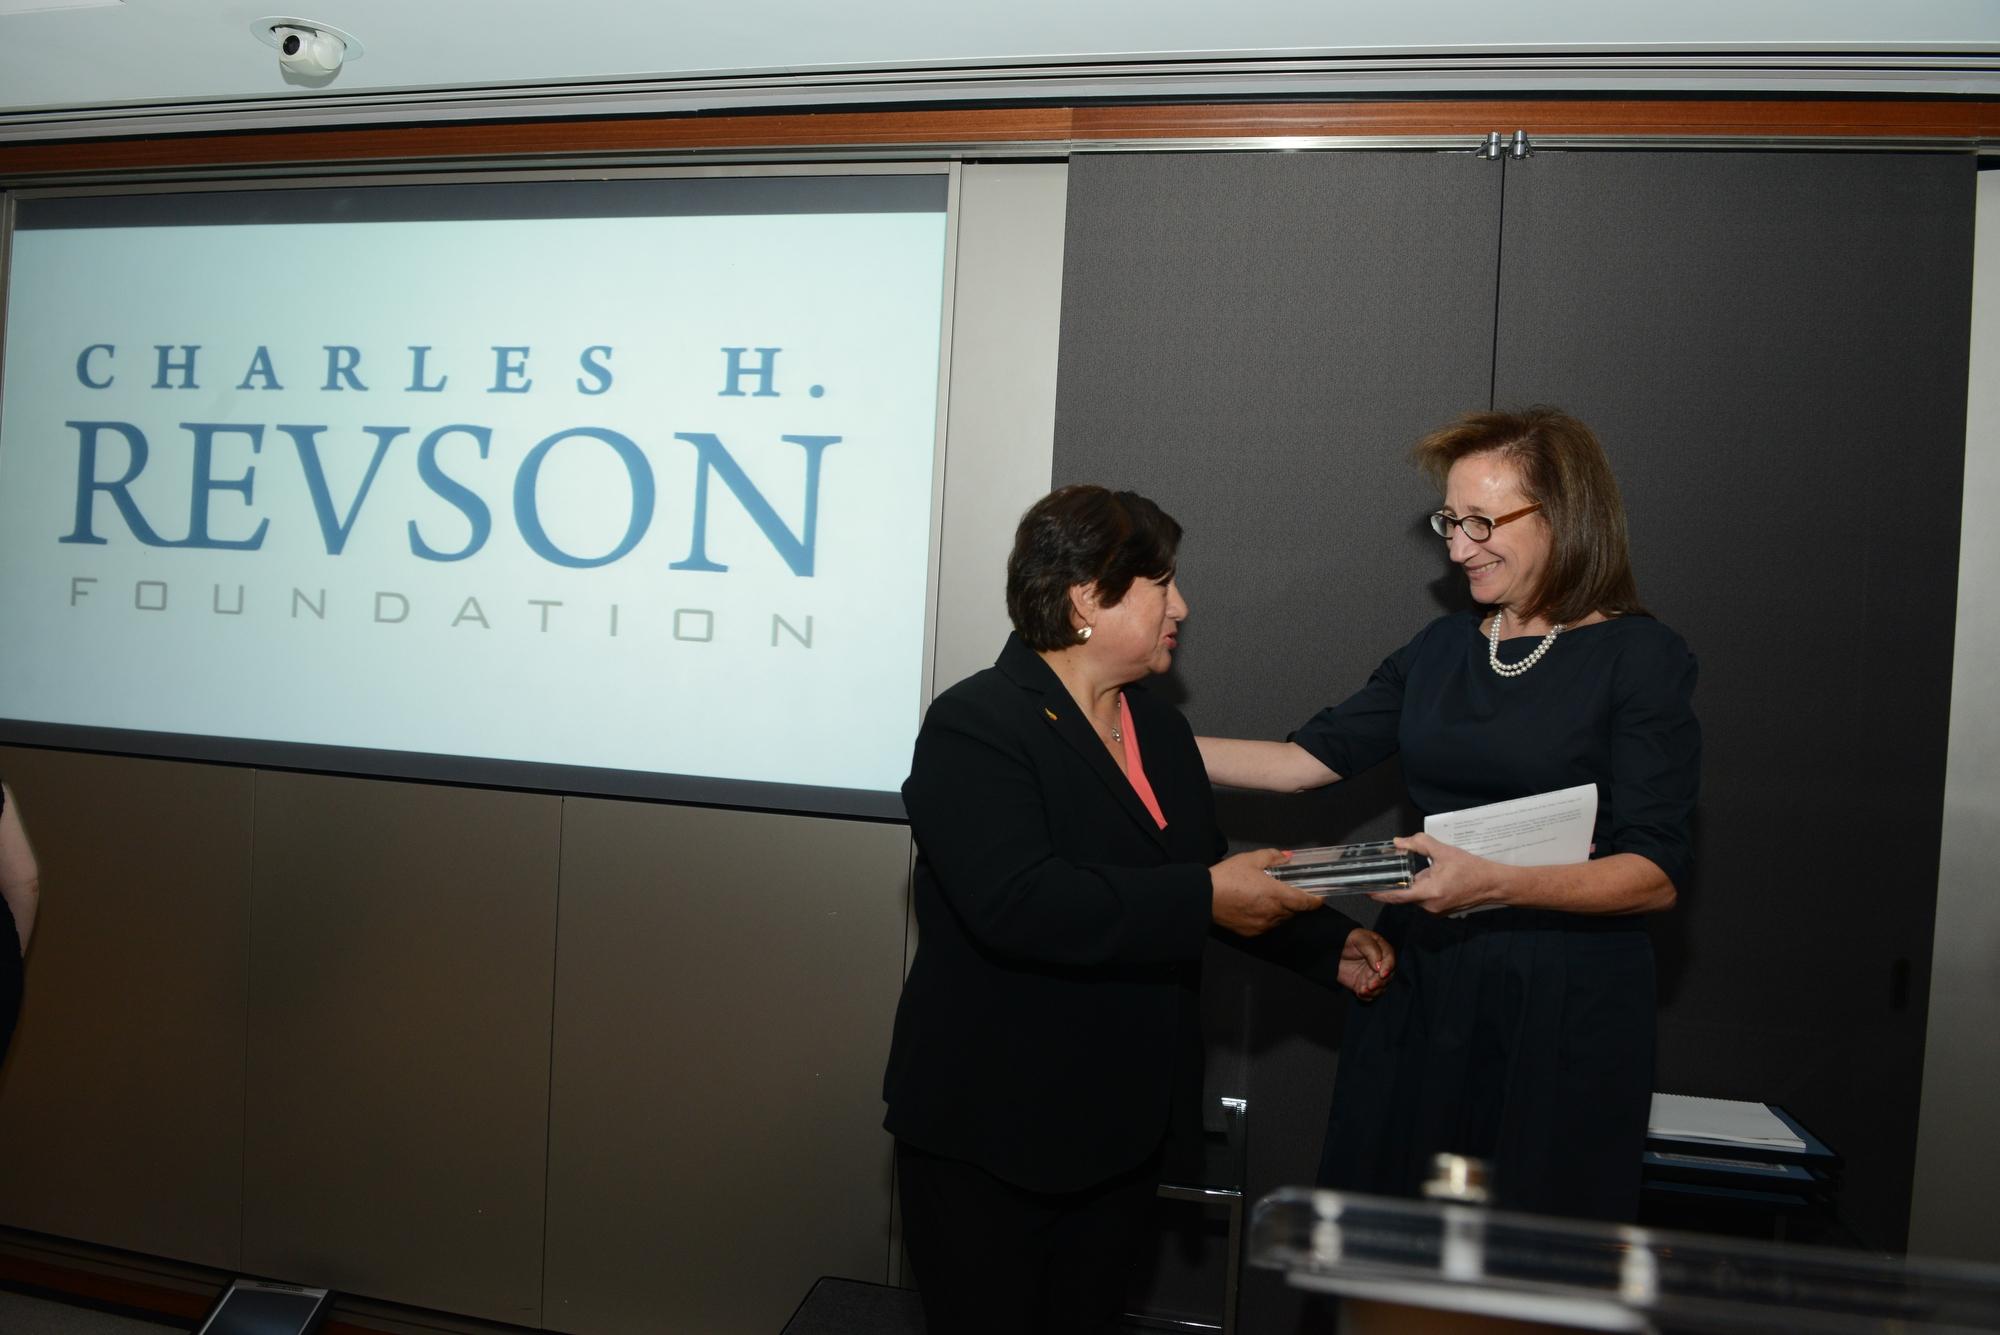 Revson Foundation